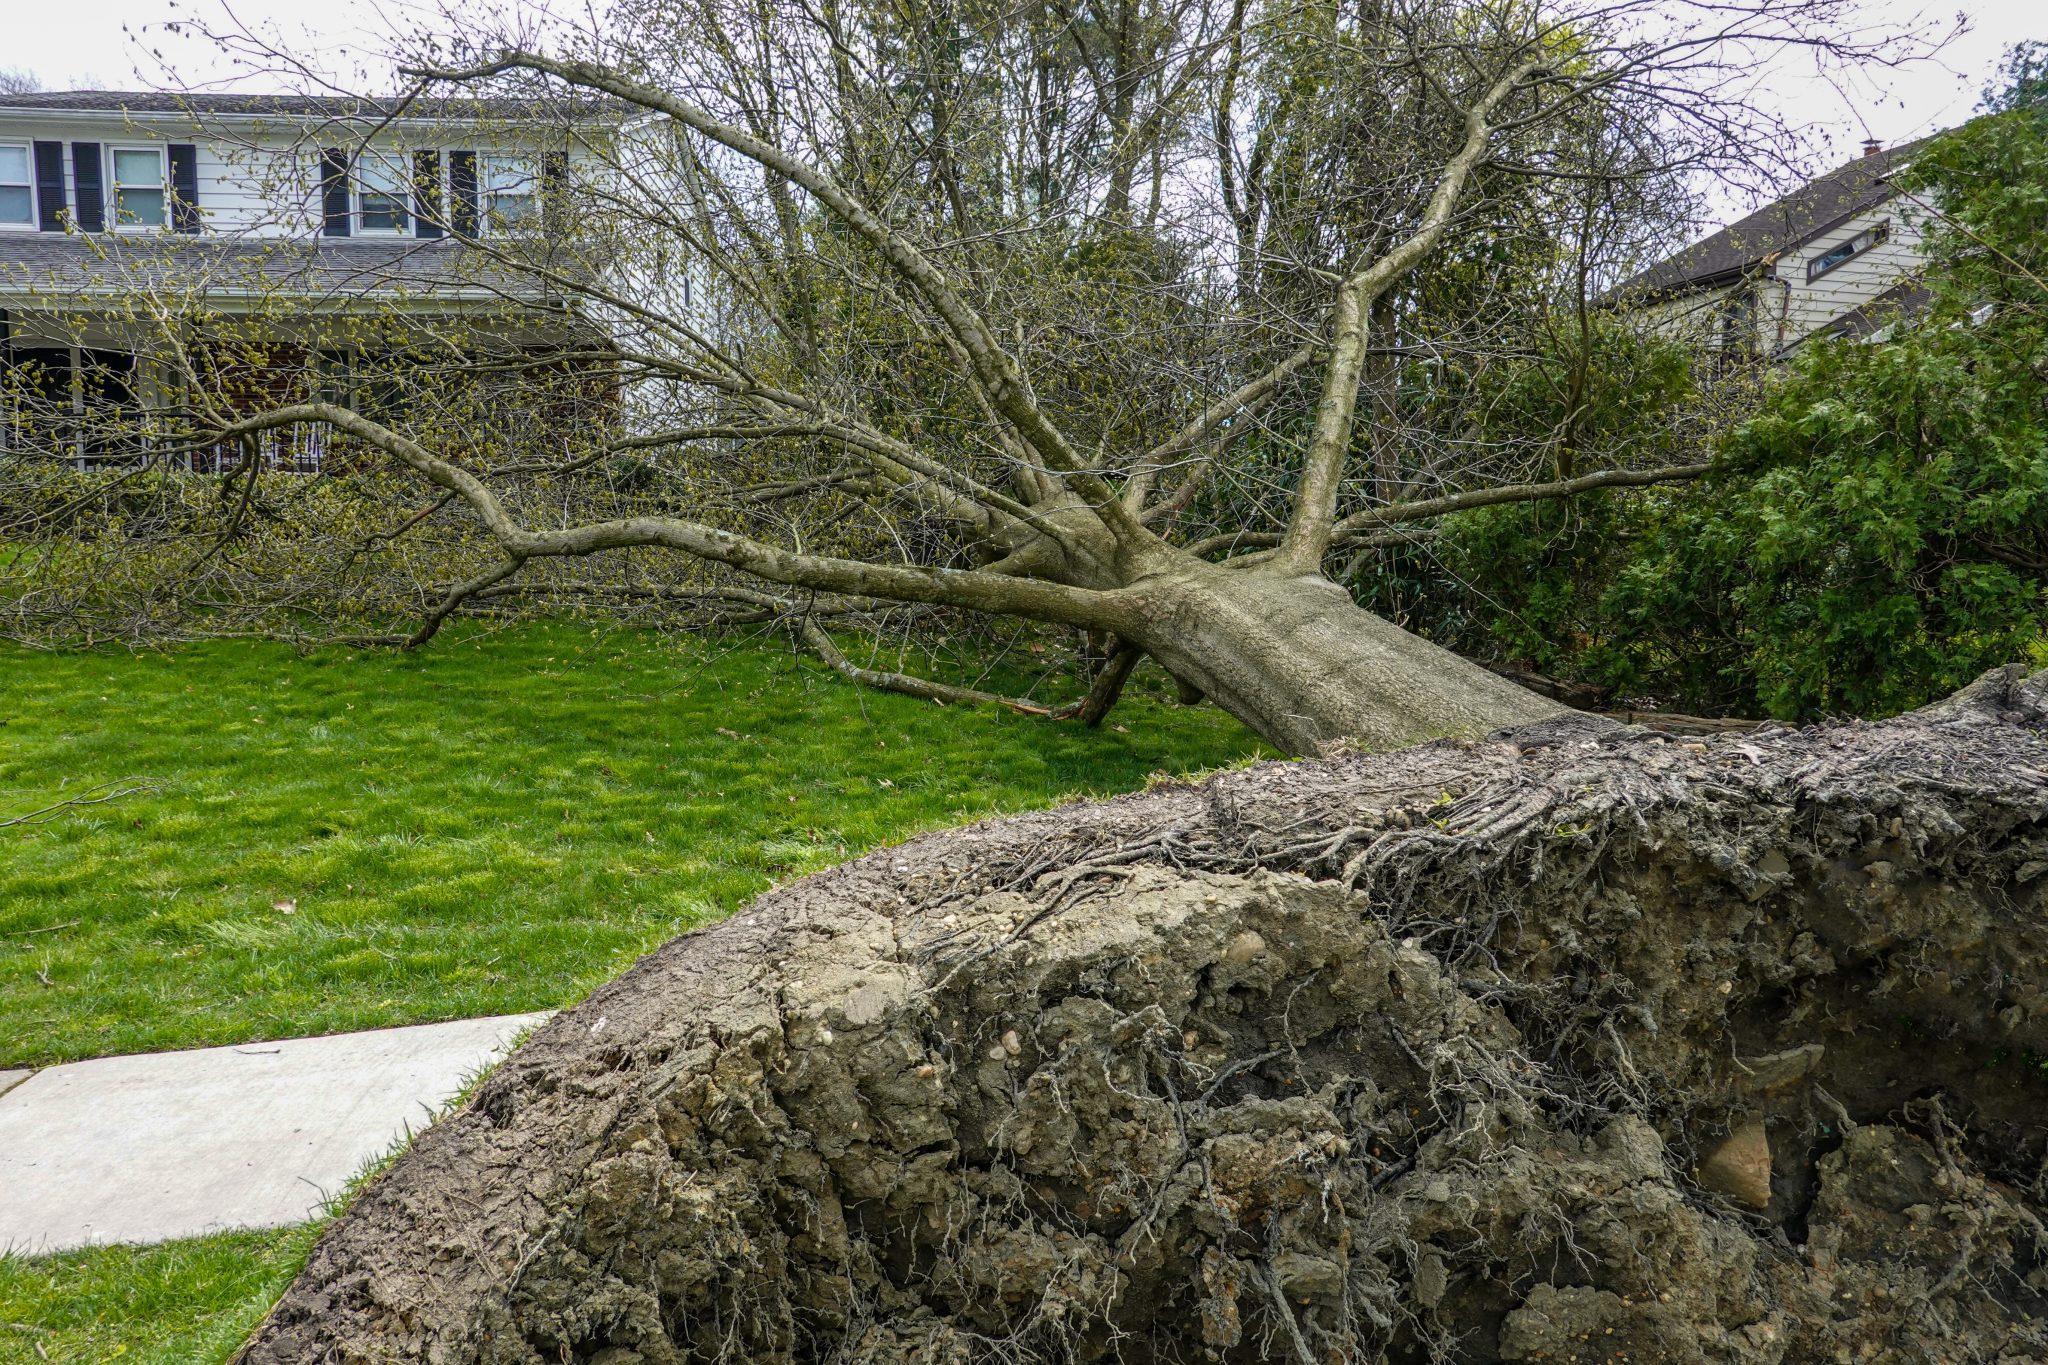 Uprooted tree in a neighborhood